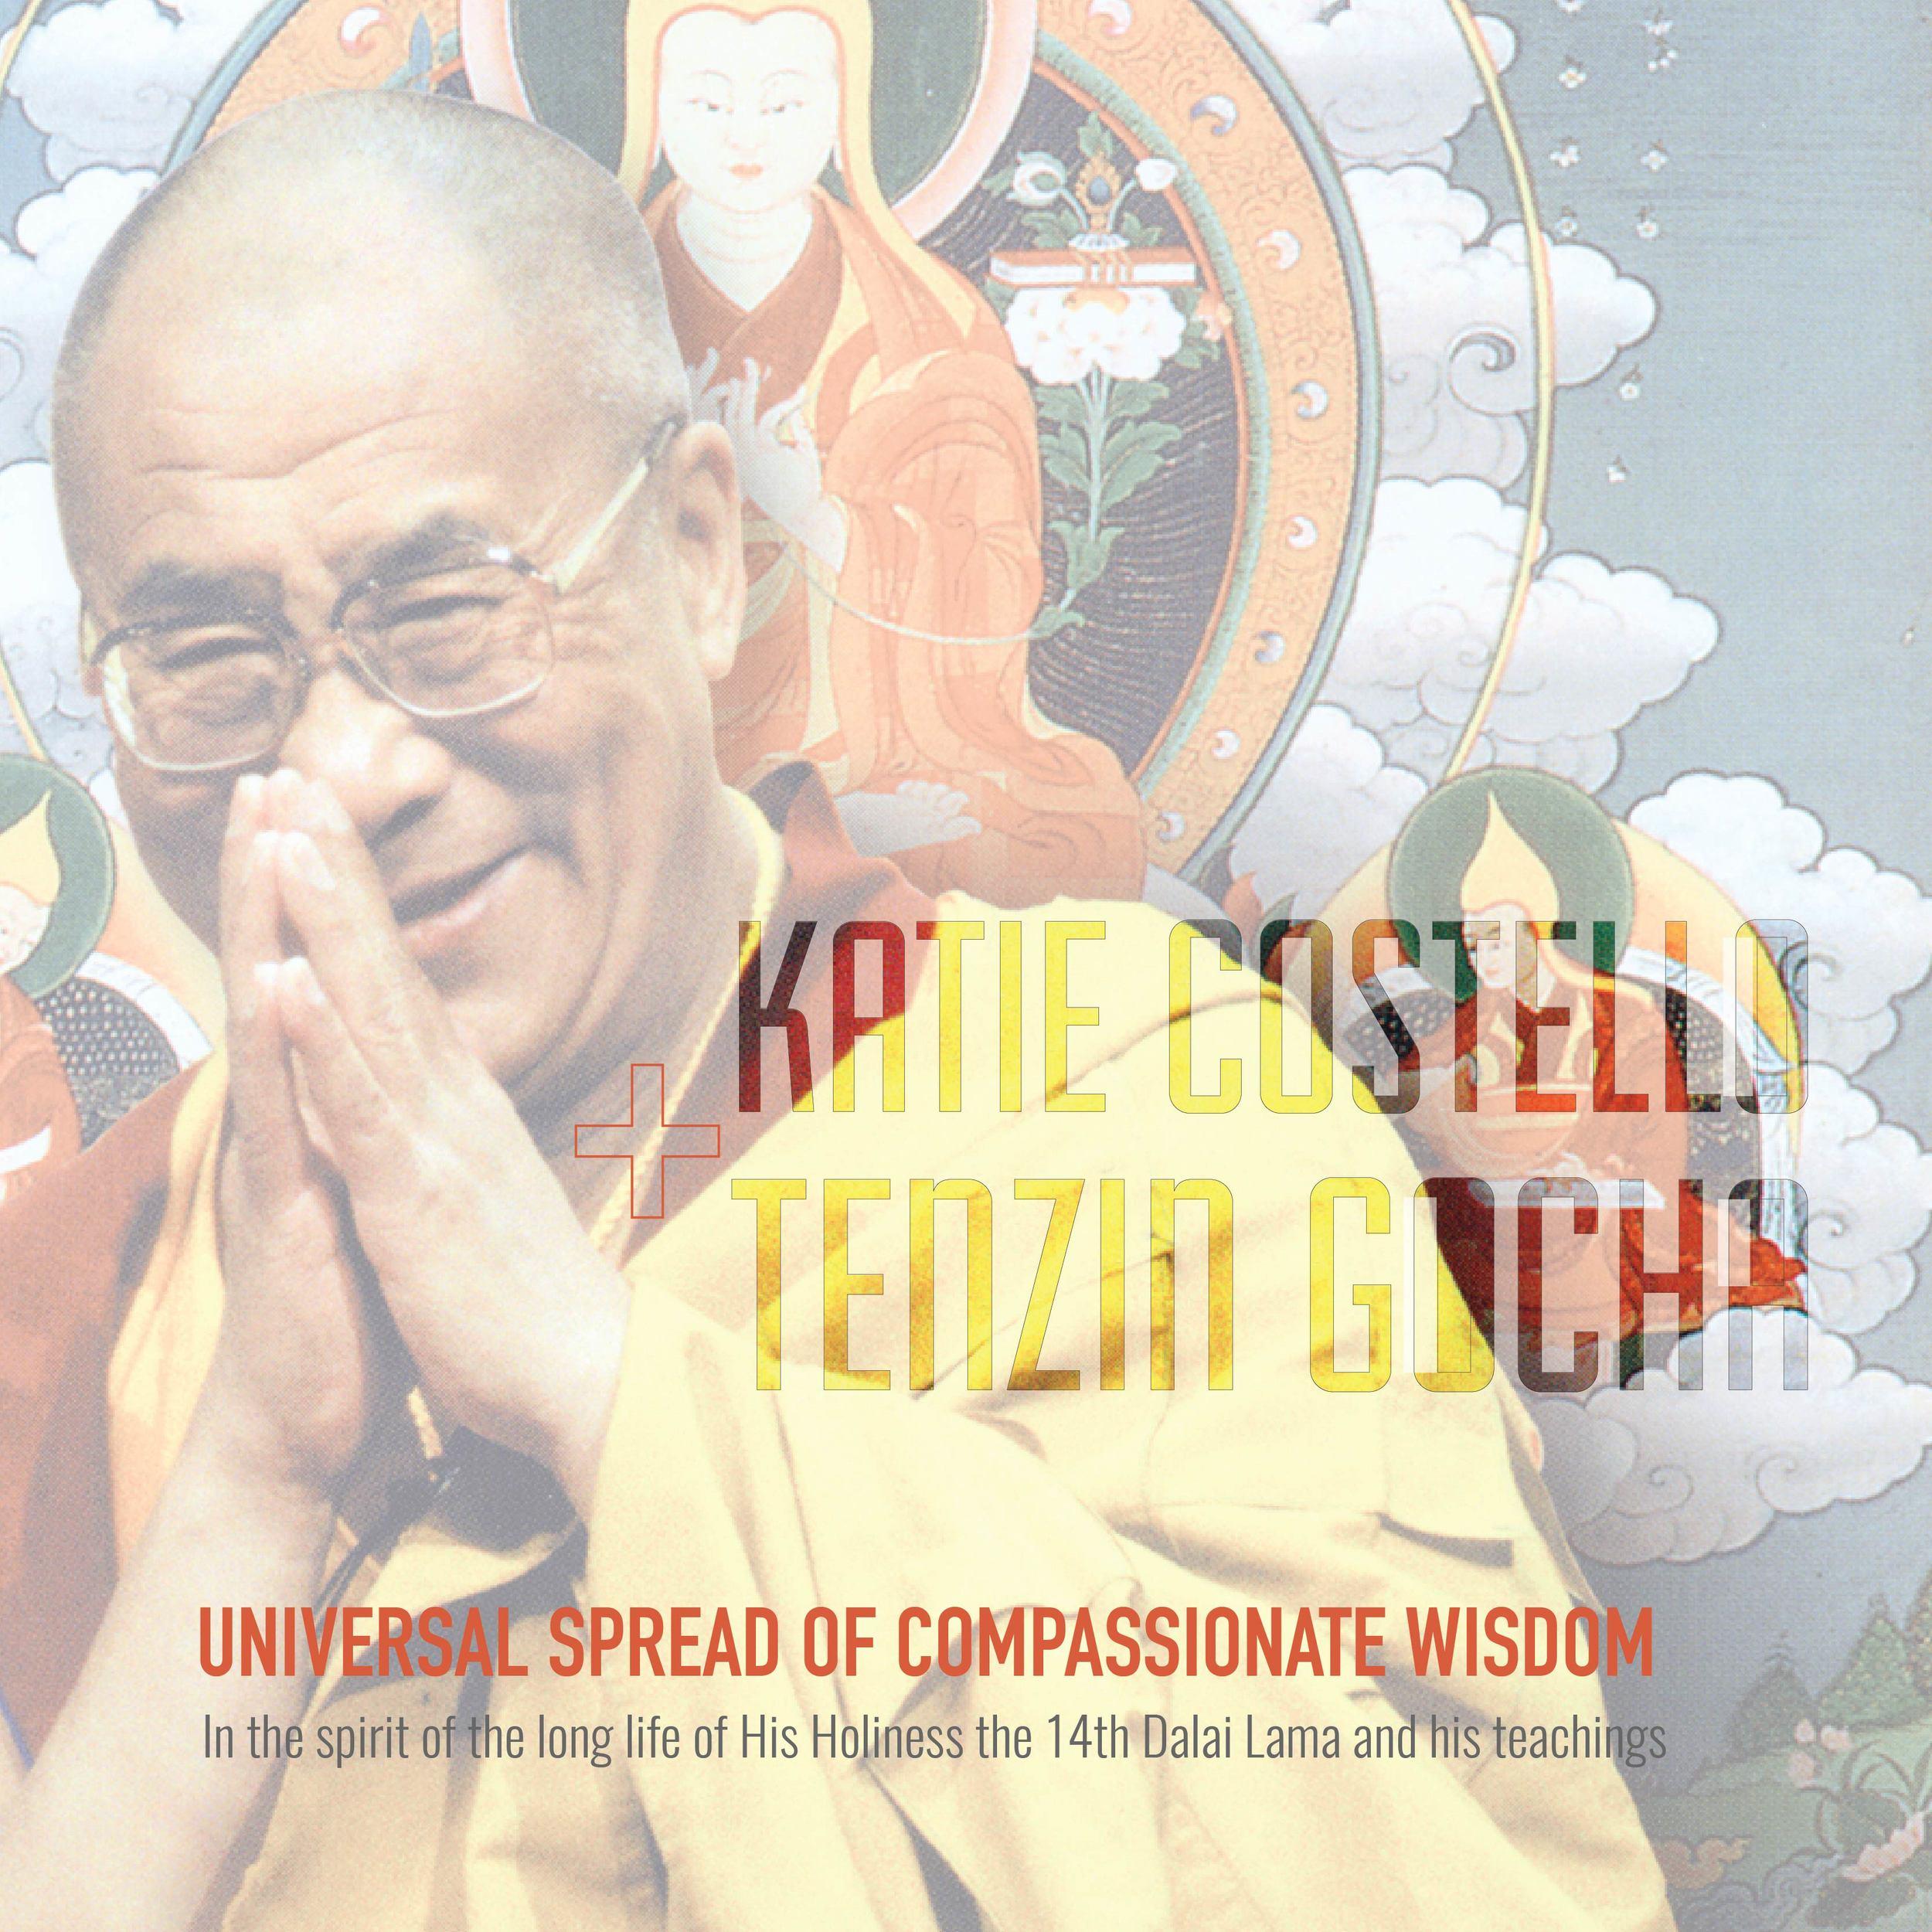 Universal Spread of Compassionate Wisdom: In the Spirit of the Long Life of His Holiness the Dalai Lama and His Teachings  Katie Costello + Tenzin Gocha    1 DALAI LAMA'S MANTRA 2 MIK TSE MA (LAMA TSONGKHAPA) 3 MANJUSHRI'S MANTRA BONUS TRACK: MANJUSHRI'S MANTRA (DANCE VERSION)     © Katie Costello | Tenzin Gocha |  REBEL POP Records |2015 |All Rights Reserved